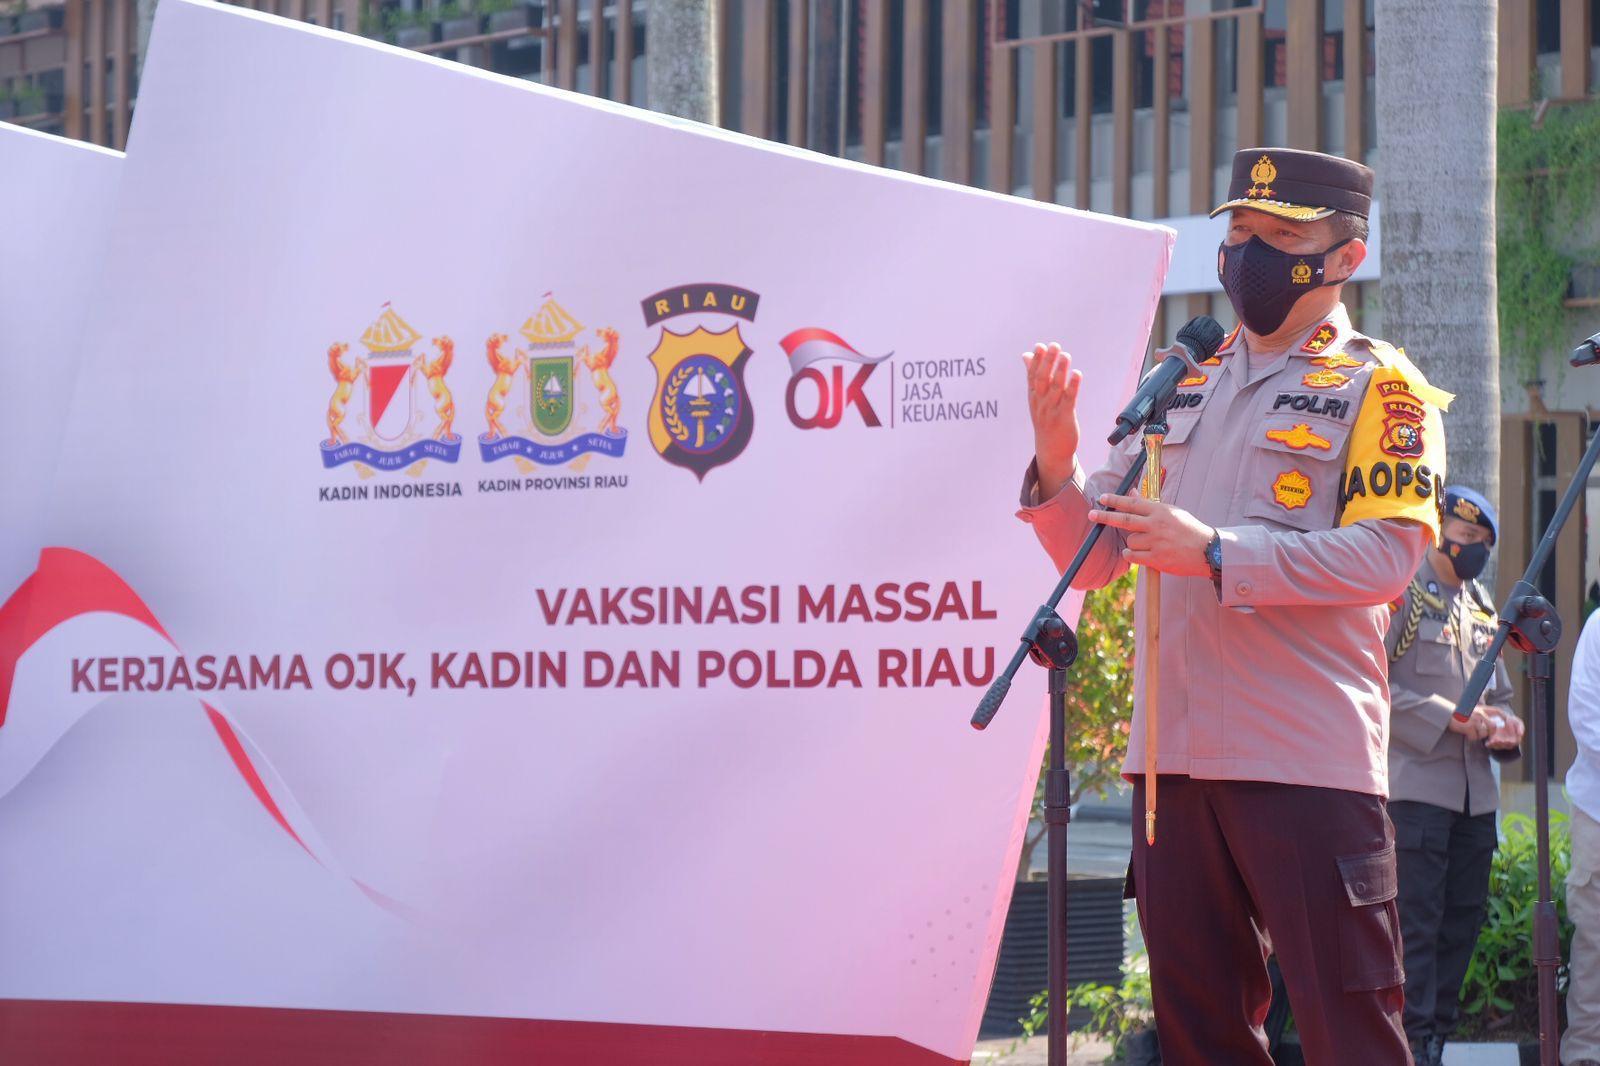 Gandeng Semua Pihak Termasuk Kadin, Polda Riau Targetkan Herd Immunity Segera Tercapai